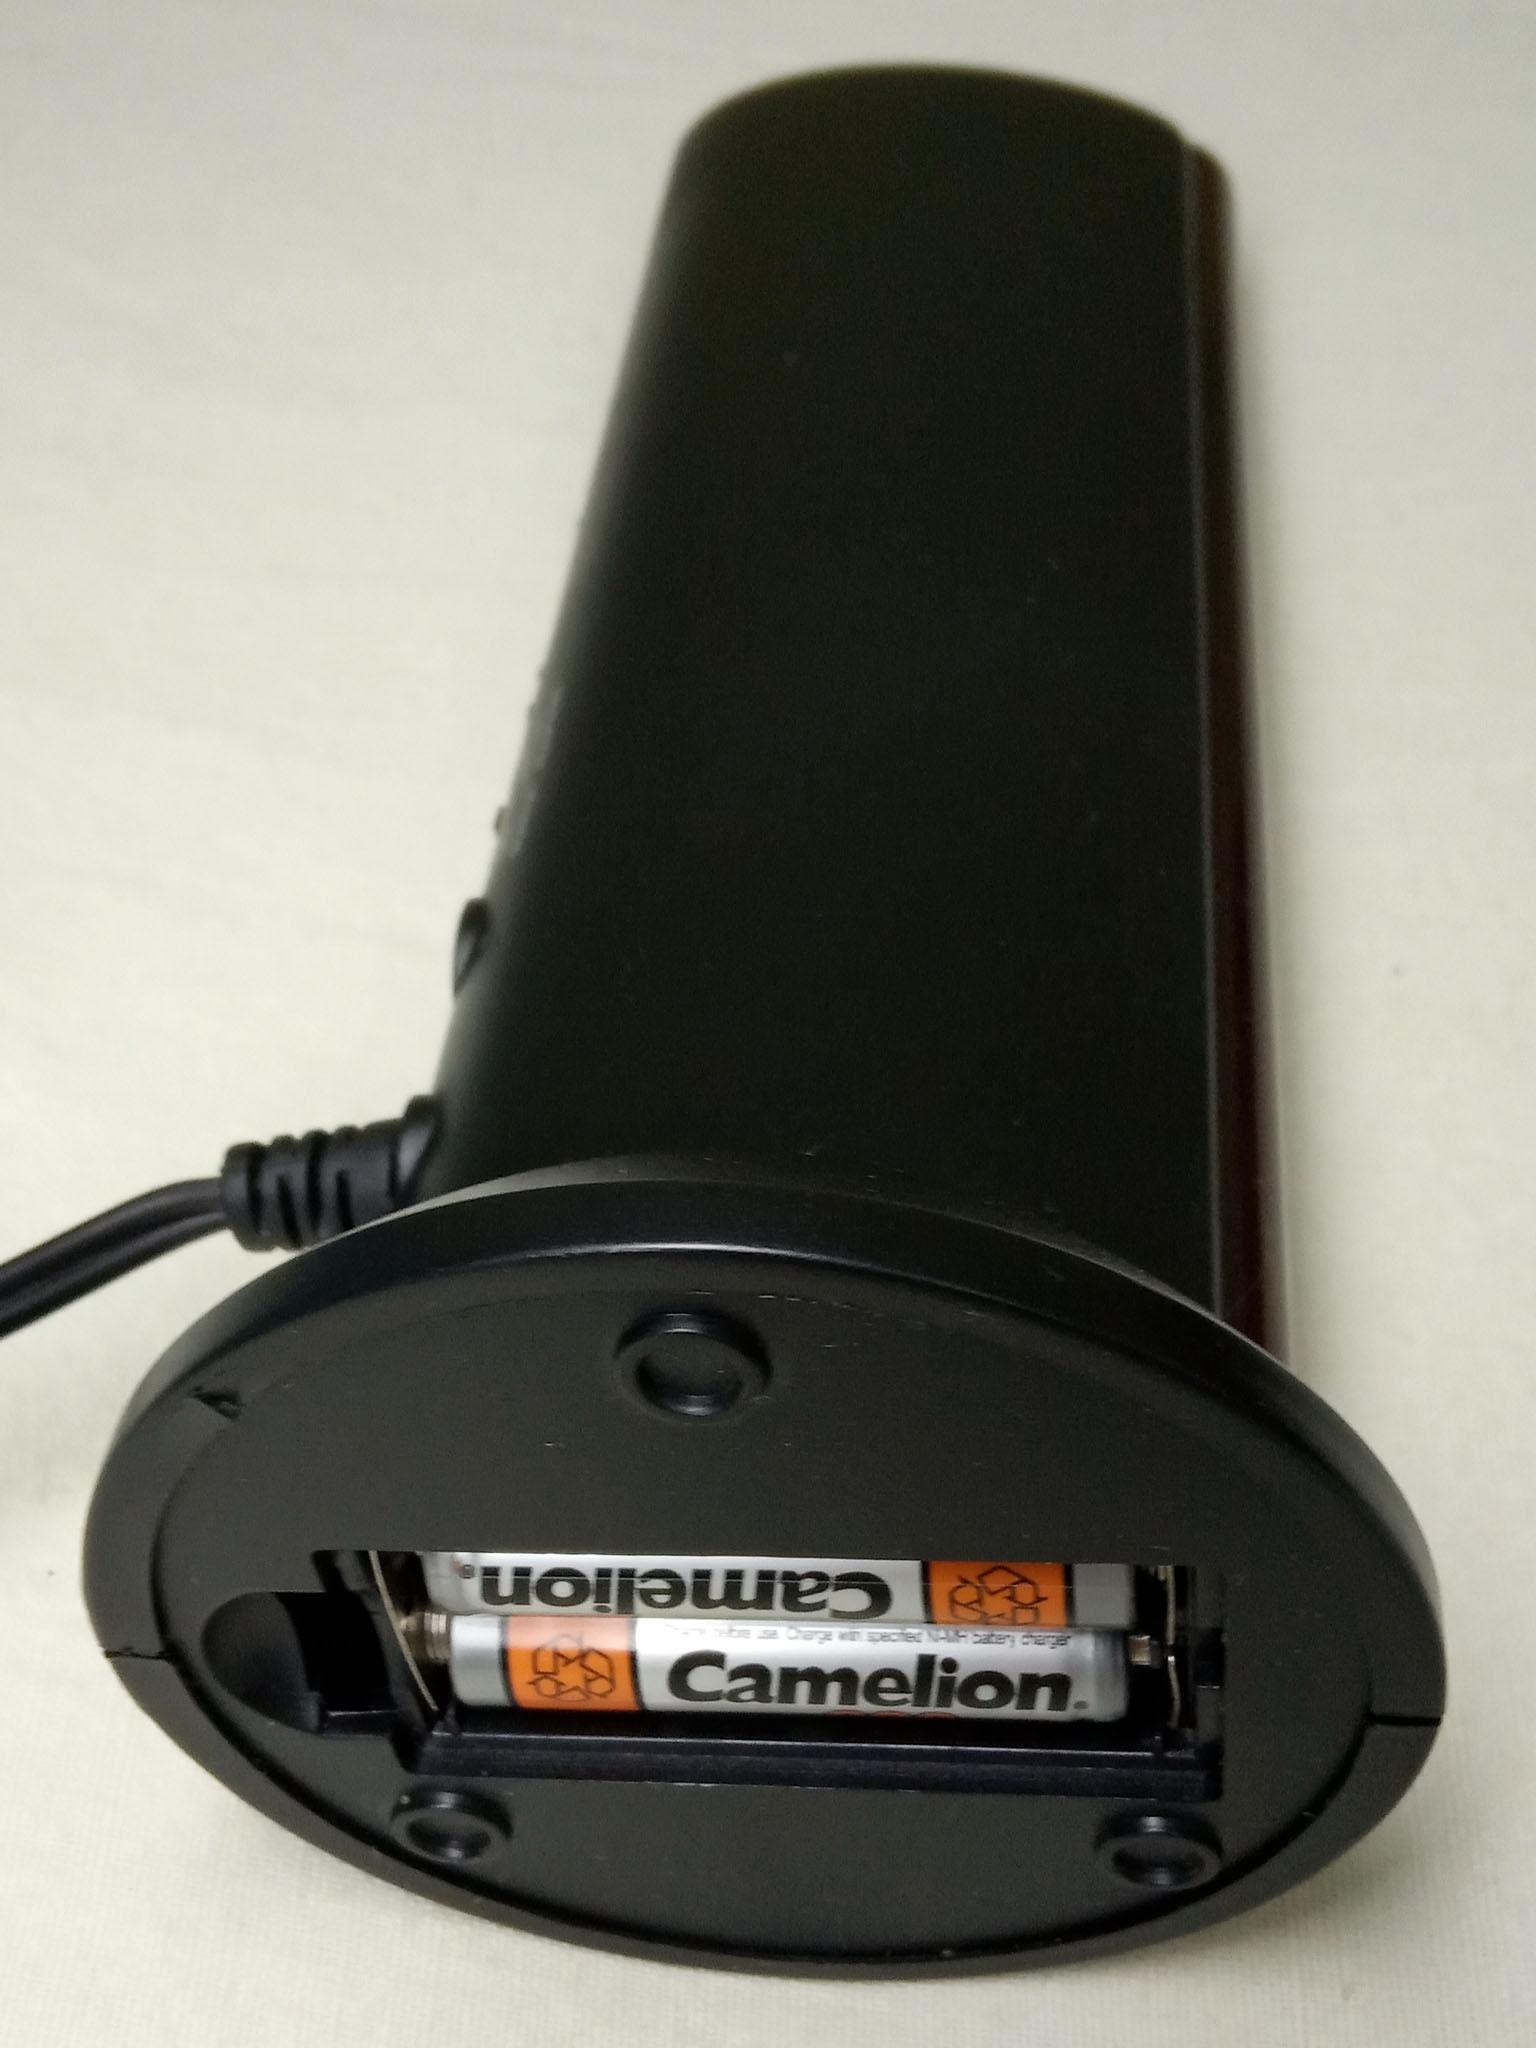 аккумуляторные батарейки в передатчике